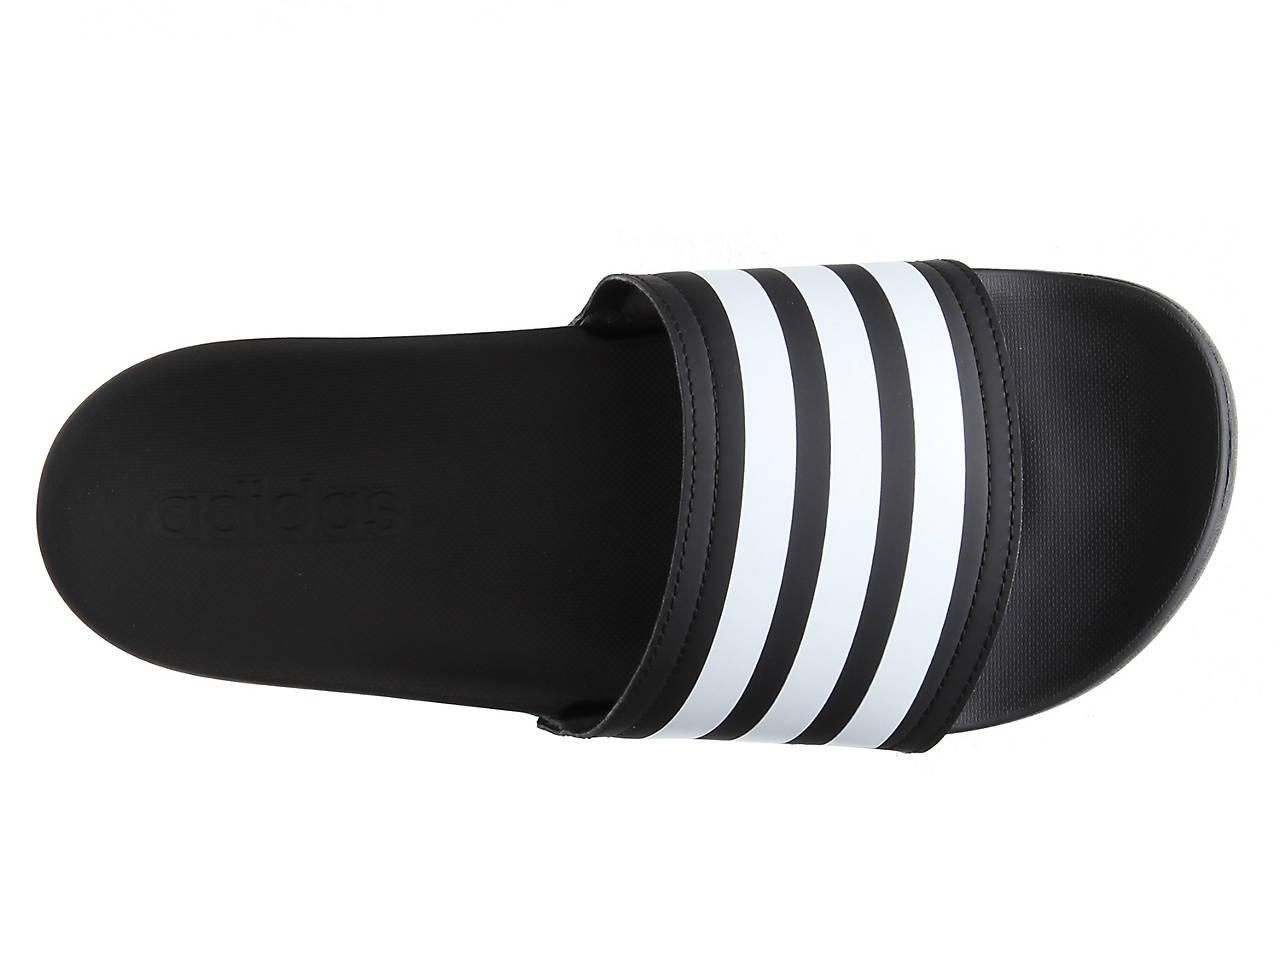 f7f5151bae9fc1 adidas Adilette Cloudfoam Ultra Stripes Slide Sandal - Women s ...